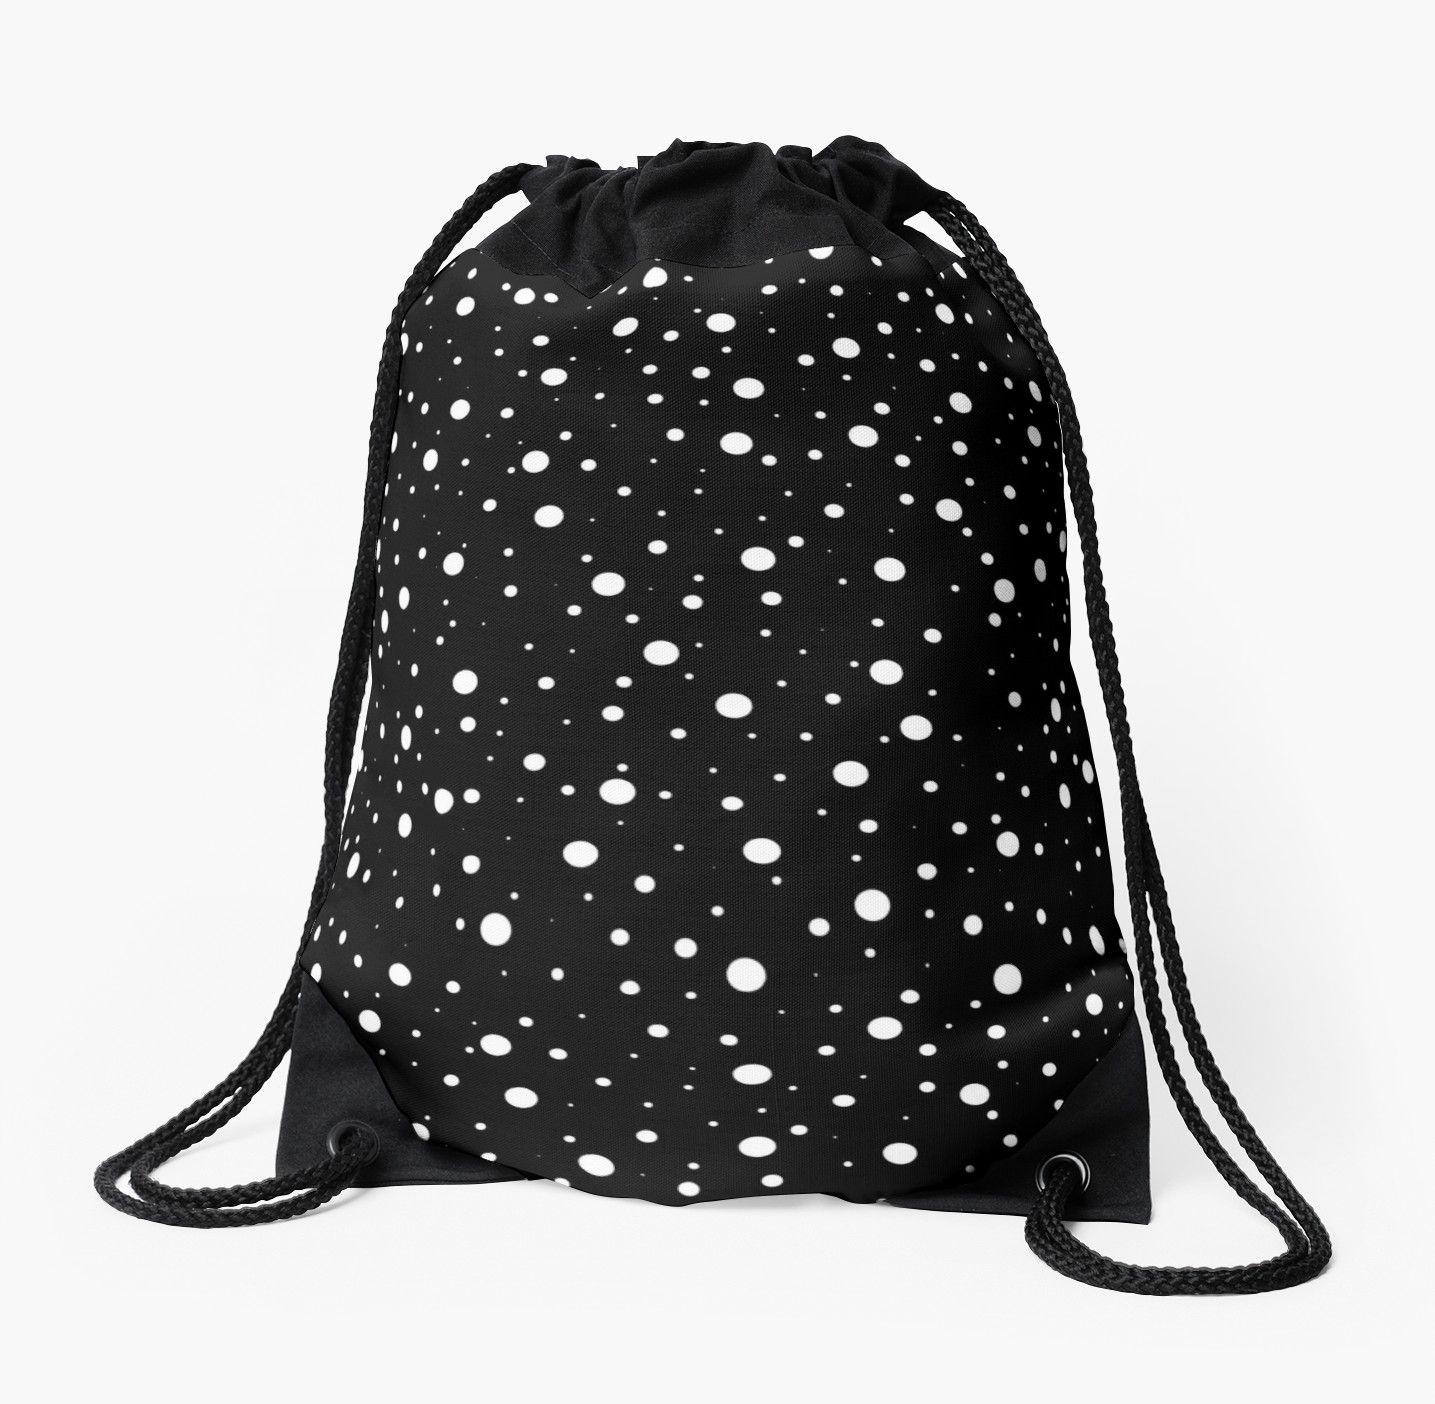 'Black and White Polka Dots (Black Background)' Drawstring